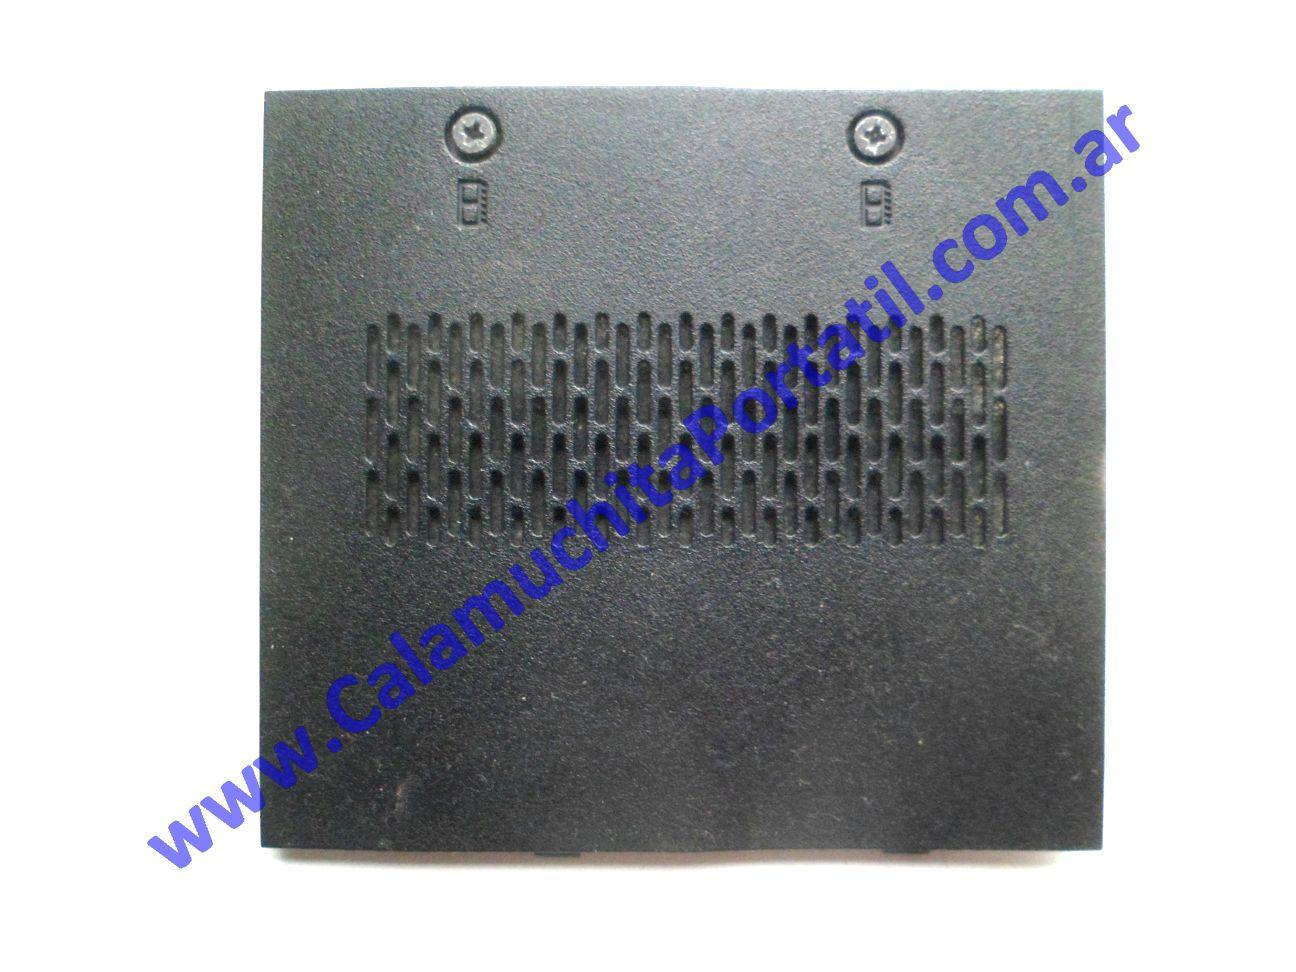 0572CTM Carcasas Tapa Memoria Hewlett Packard G60-630US / WA573UA#ABA